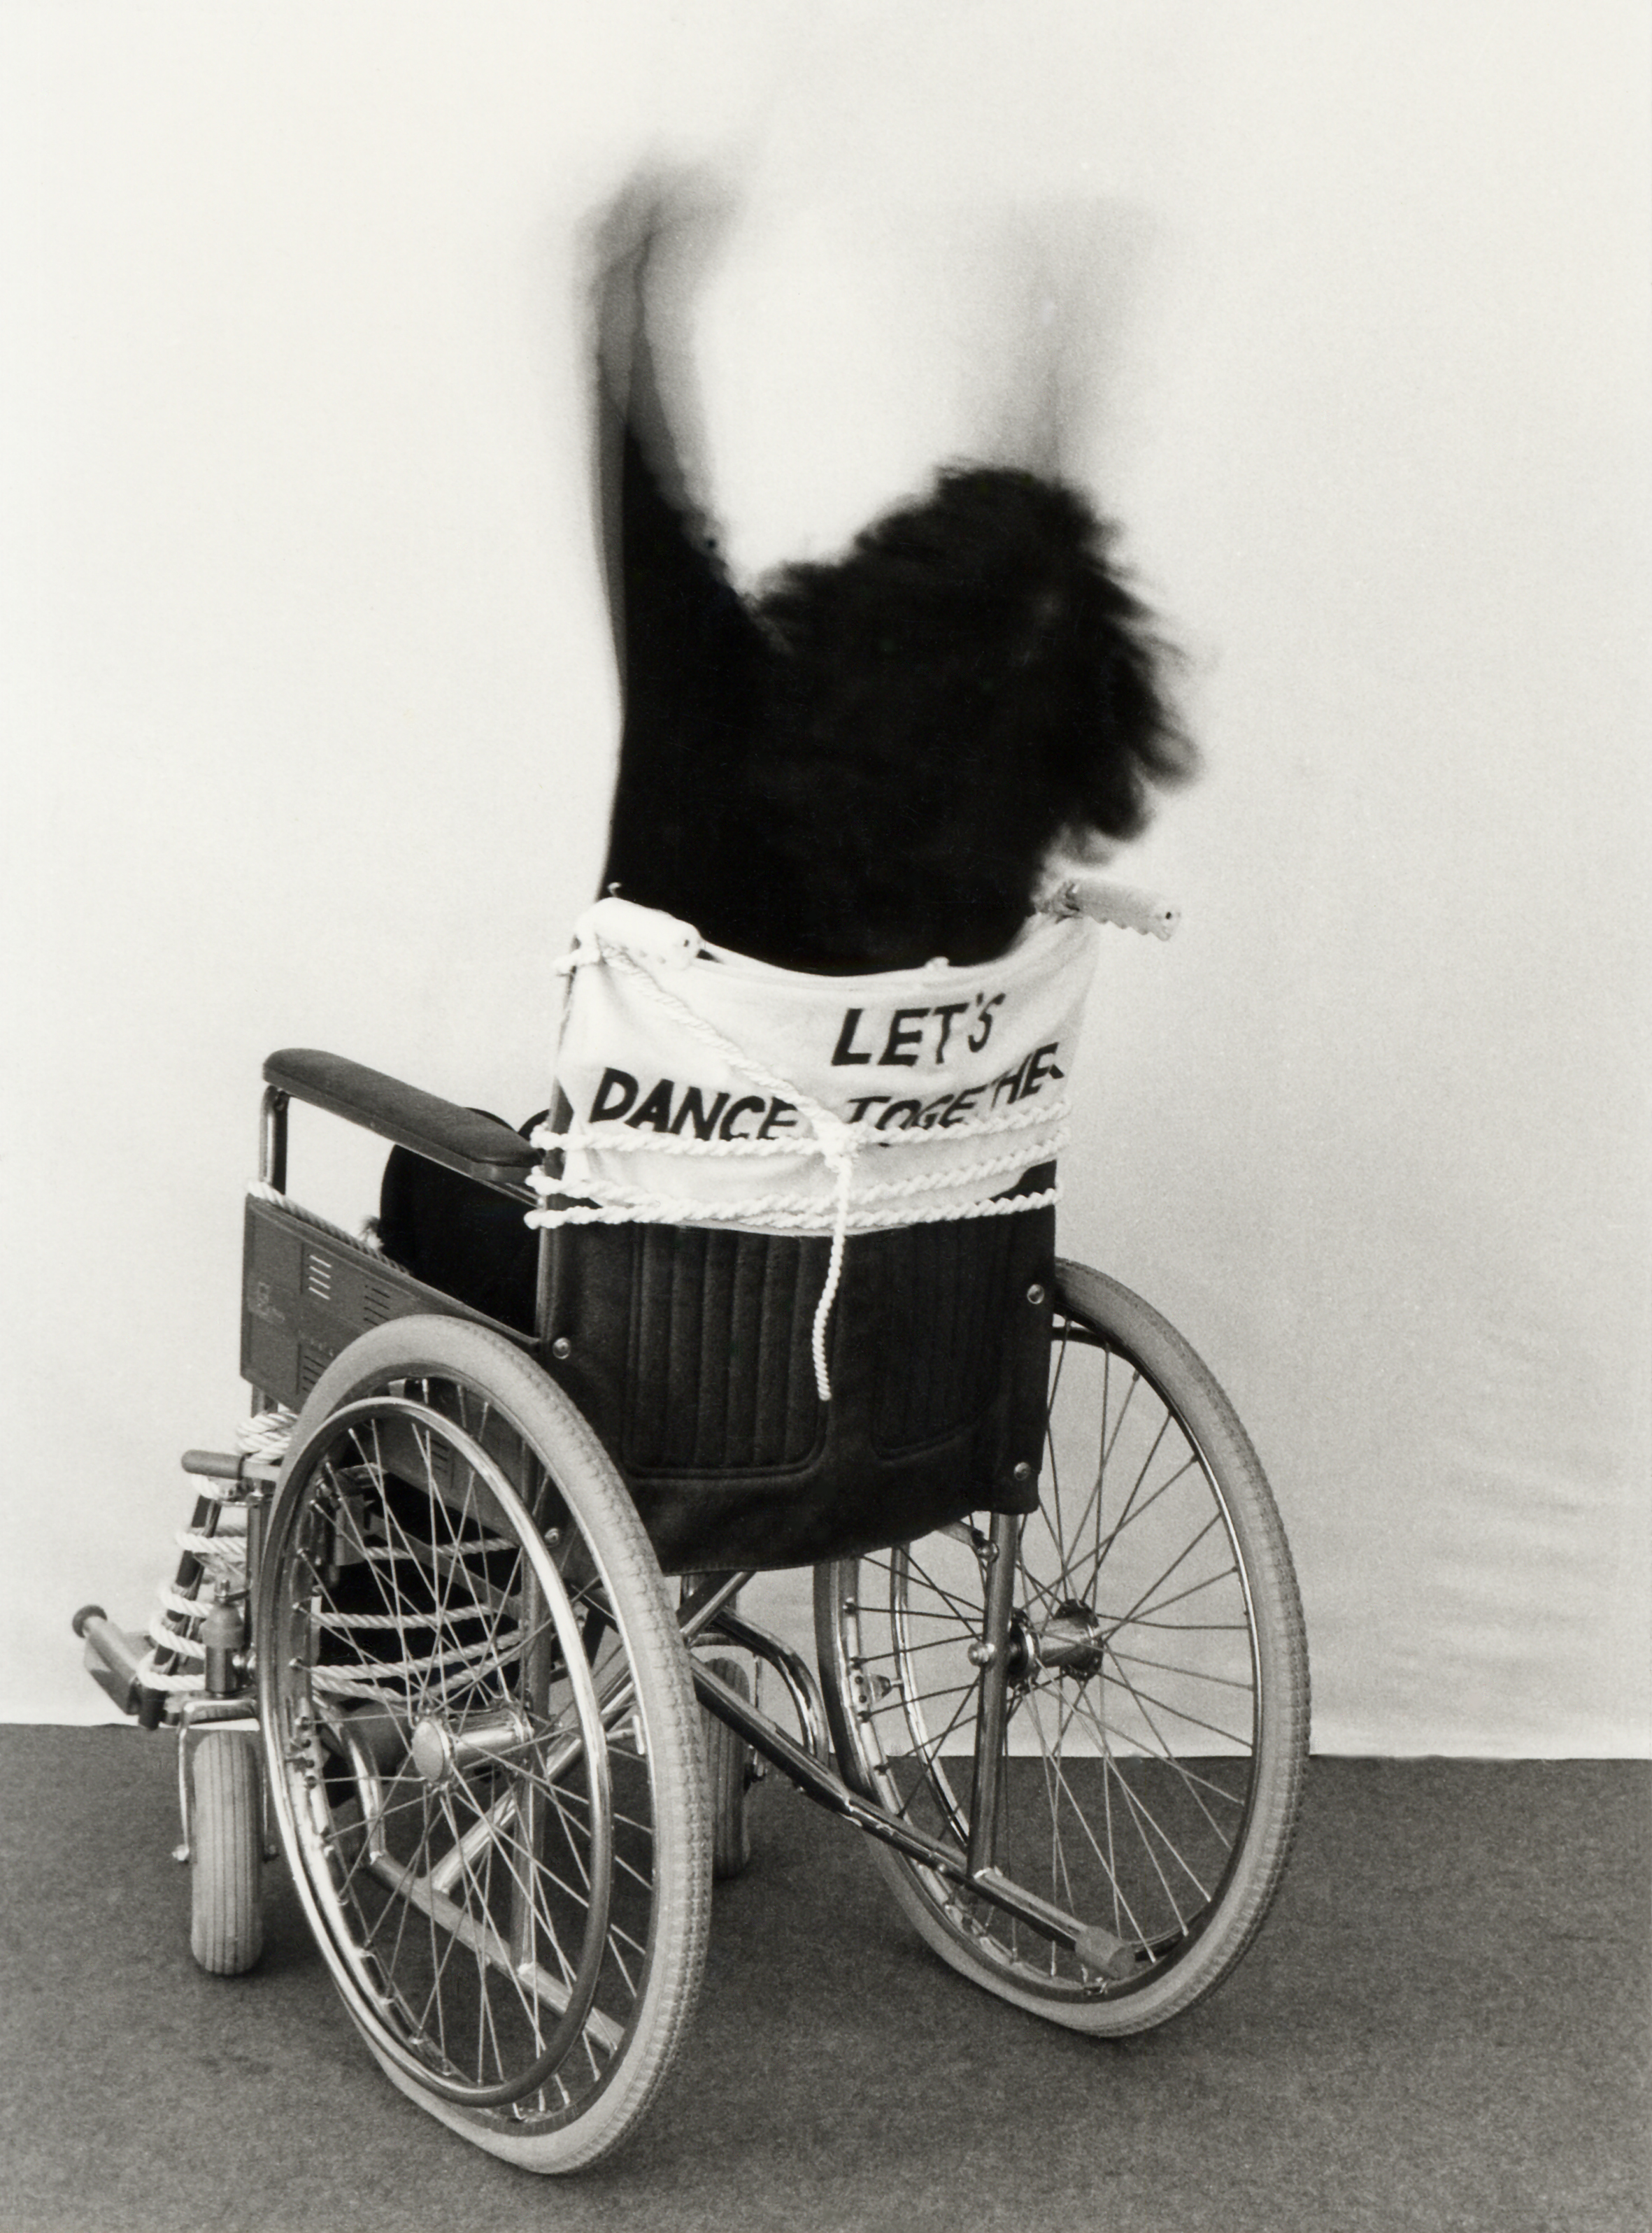 Austria Bertlmann Lets  Dance Together  1978